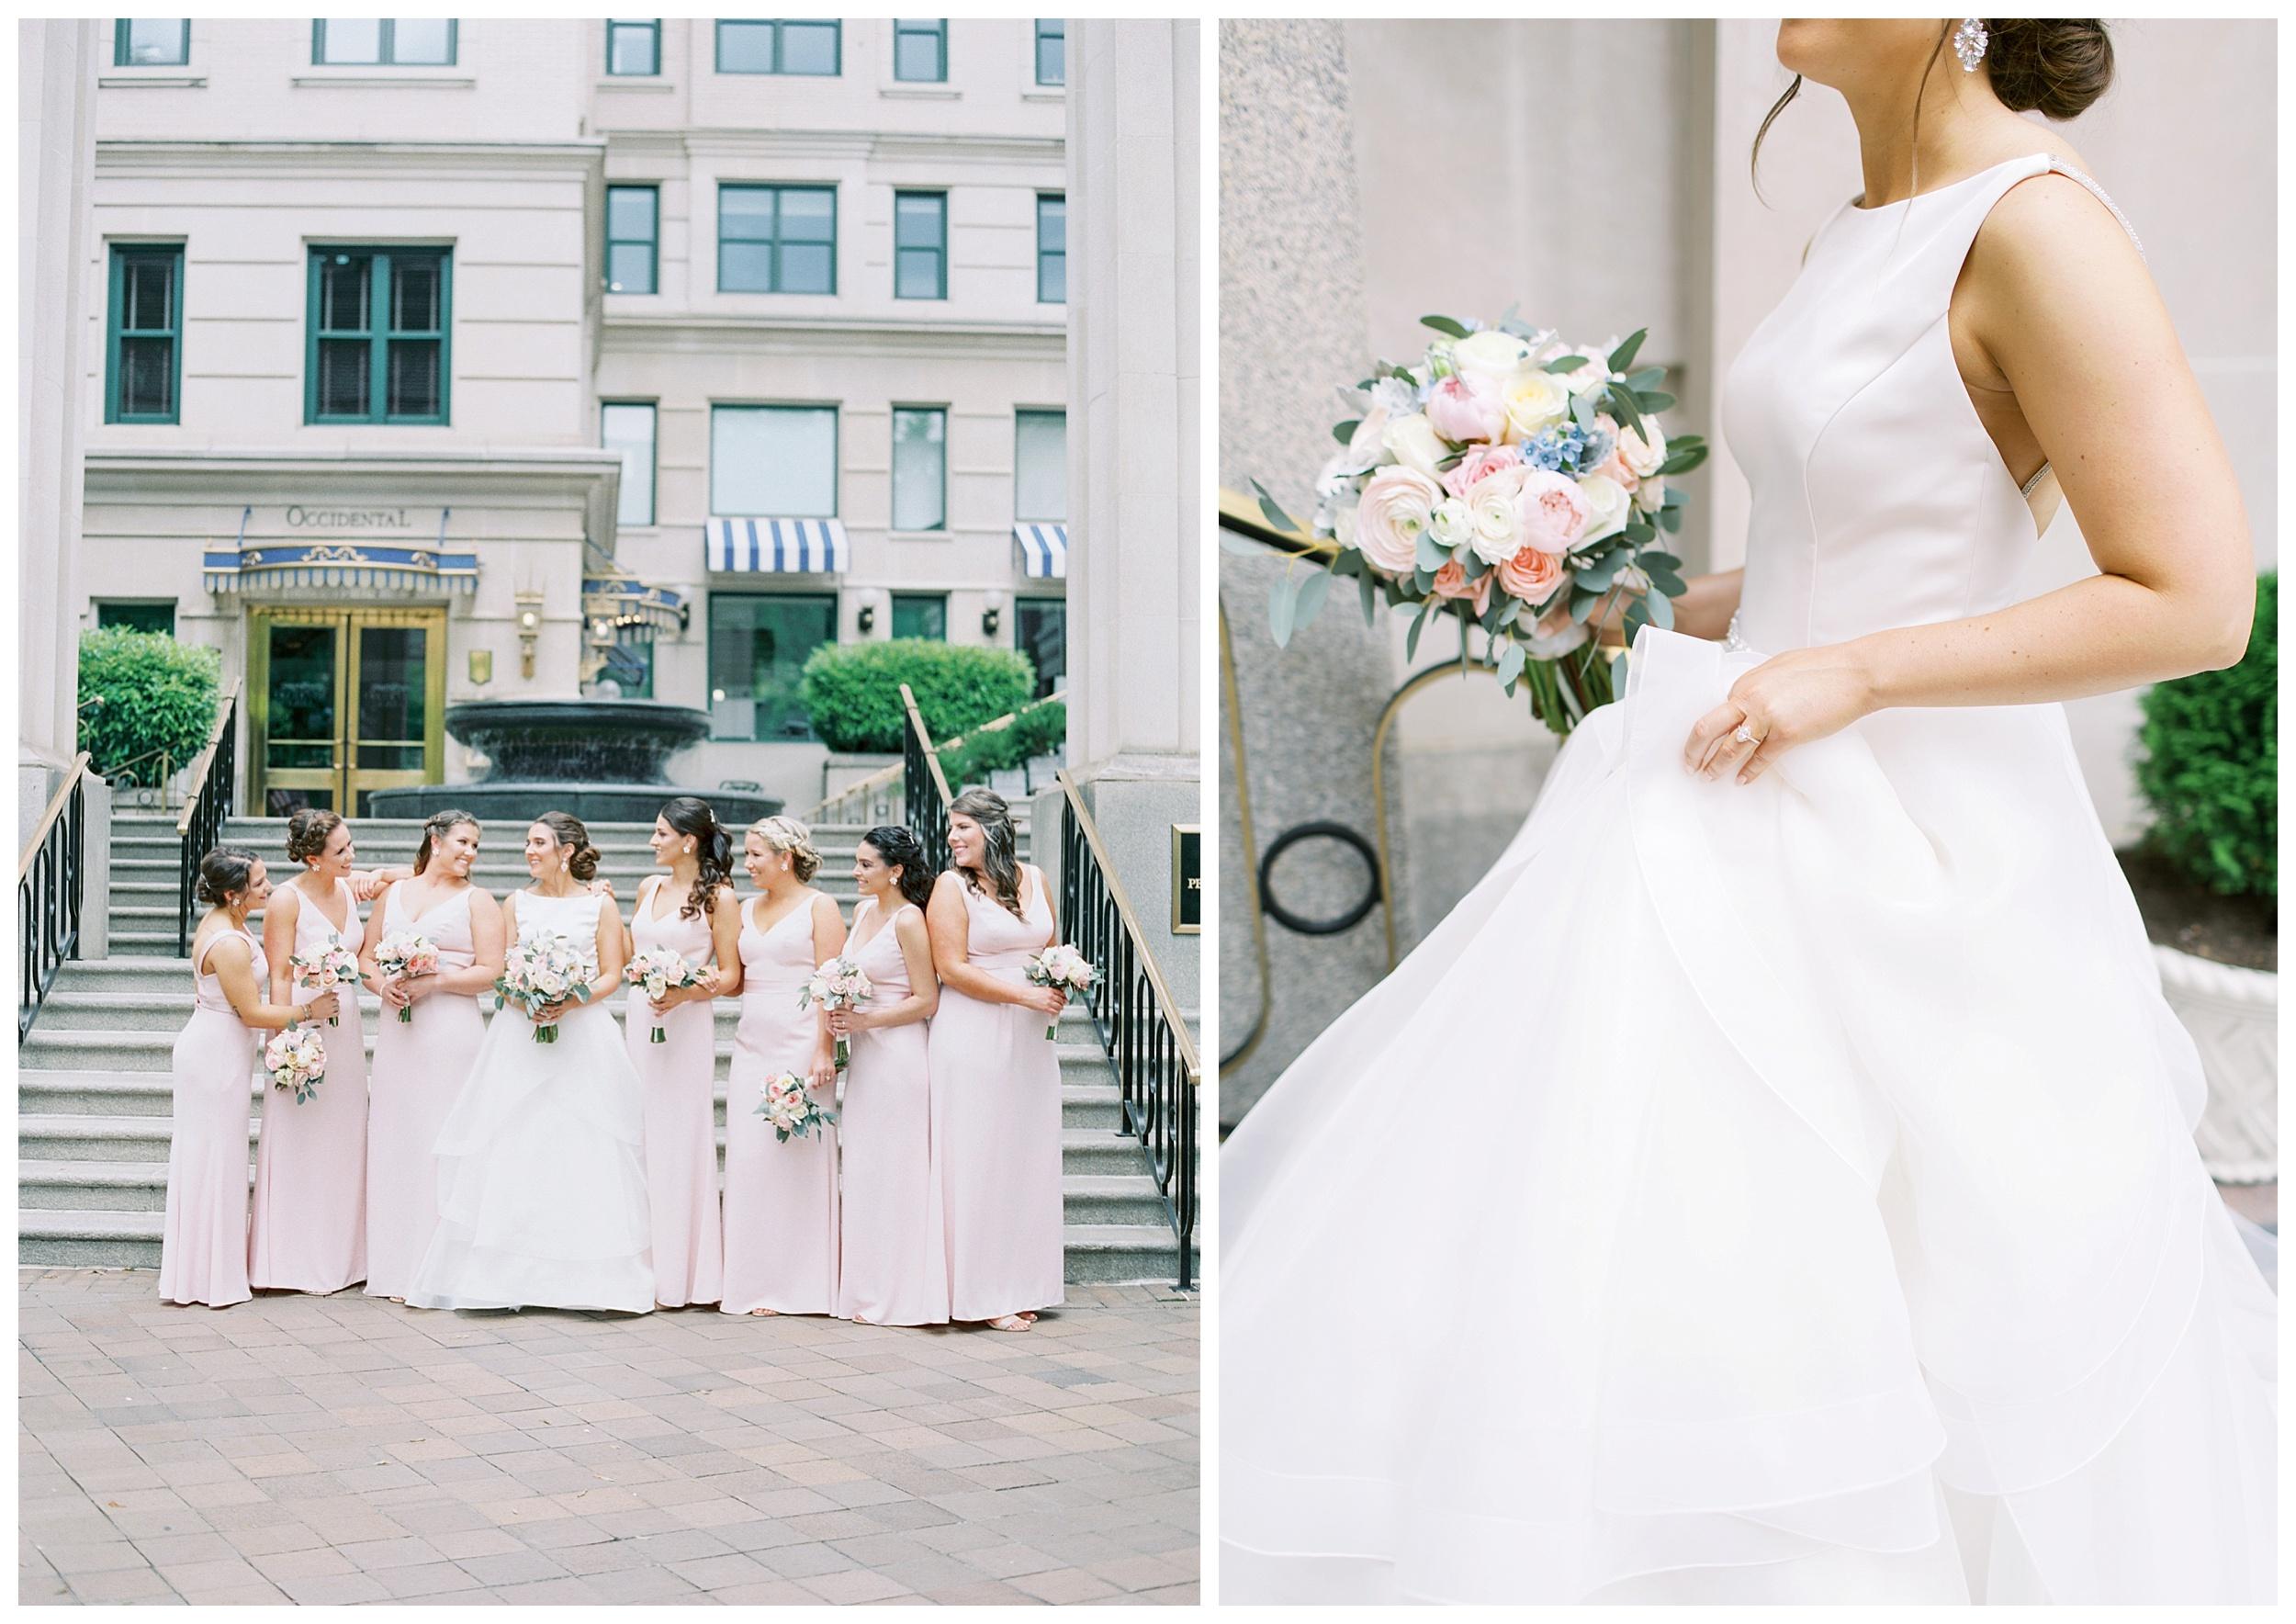 DAR Constitution Hall Wedding Wedding | Daughters of the American Revolution Wedding | District of Columbia Film Wedding Photographer Kir Tuben_0034.jpg